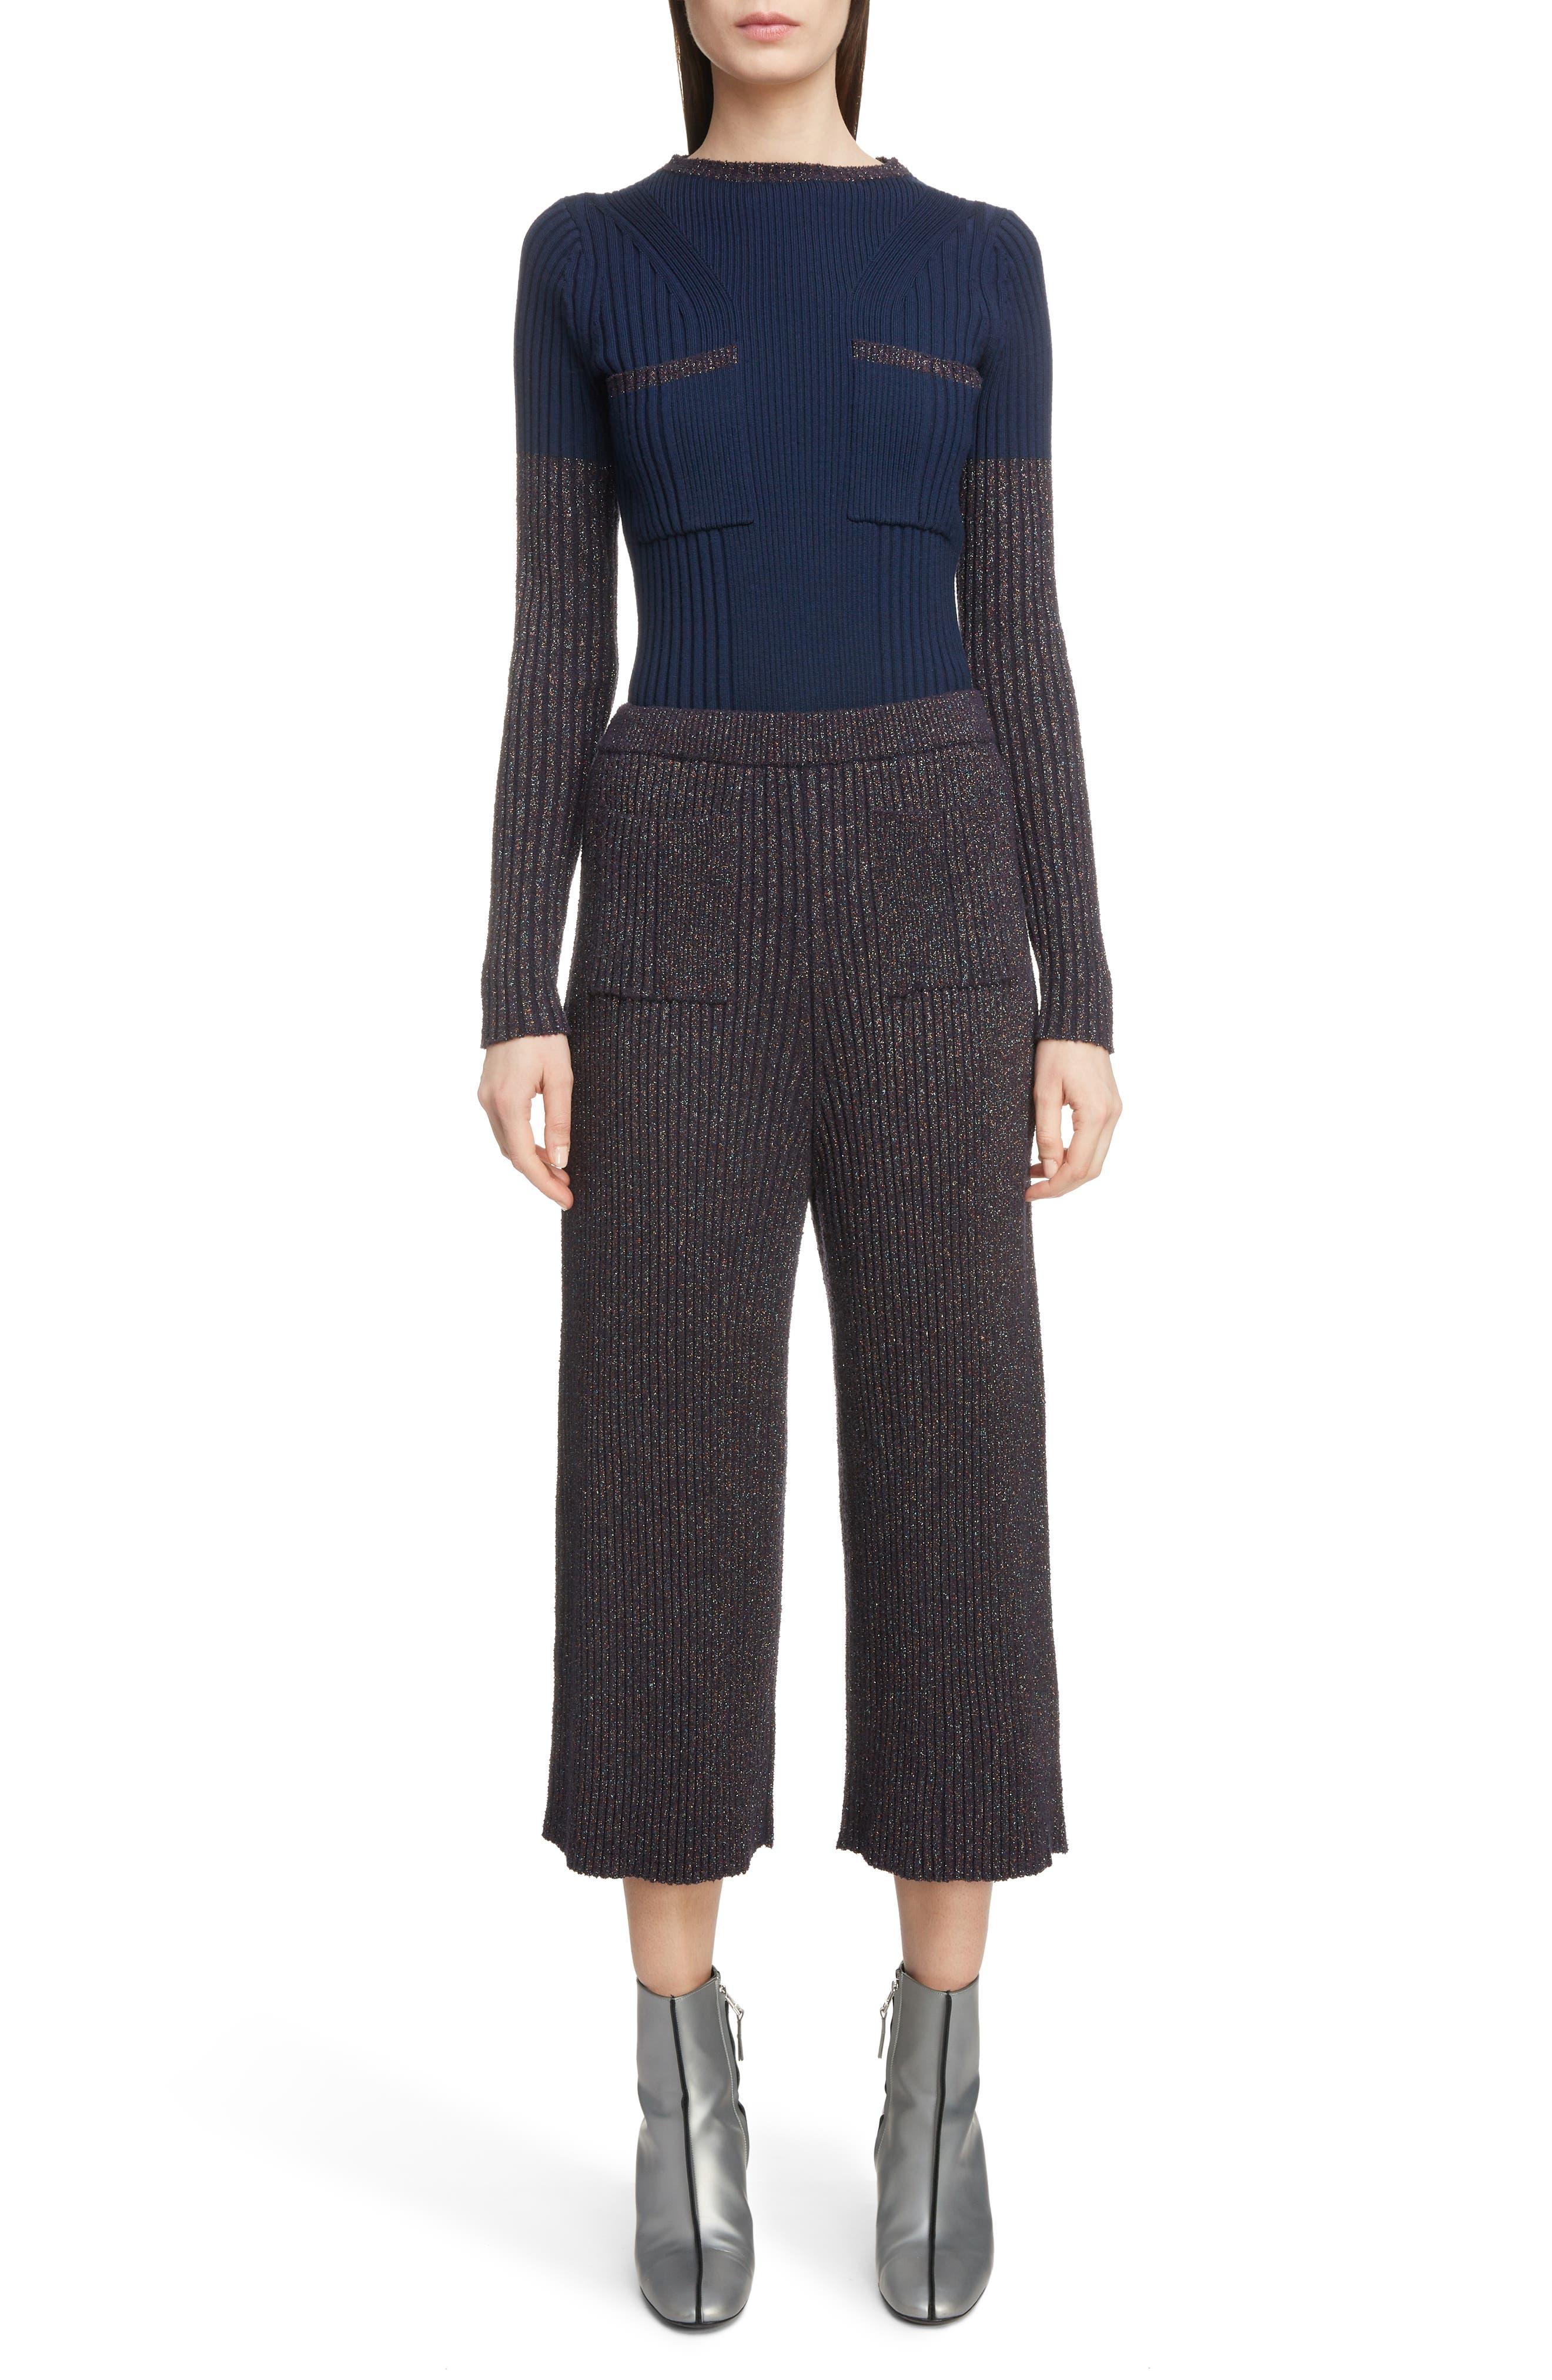 KENZO,                             Metallic Knit Culottes,                             Alternate thumbnail 8, color,                             NAVY BLUE